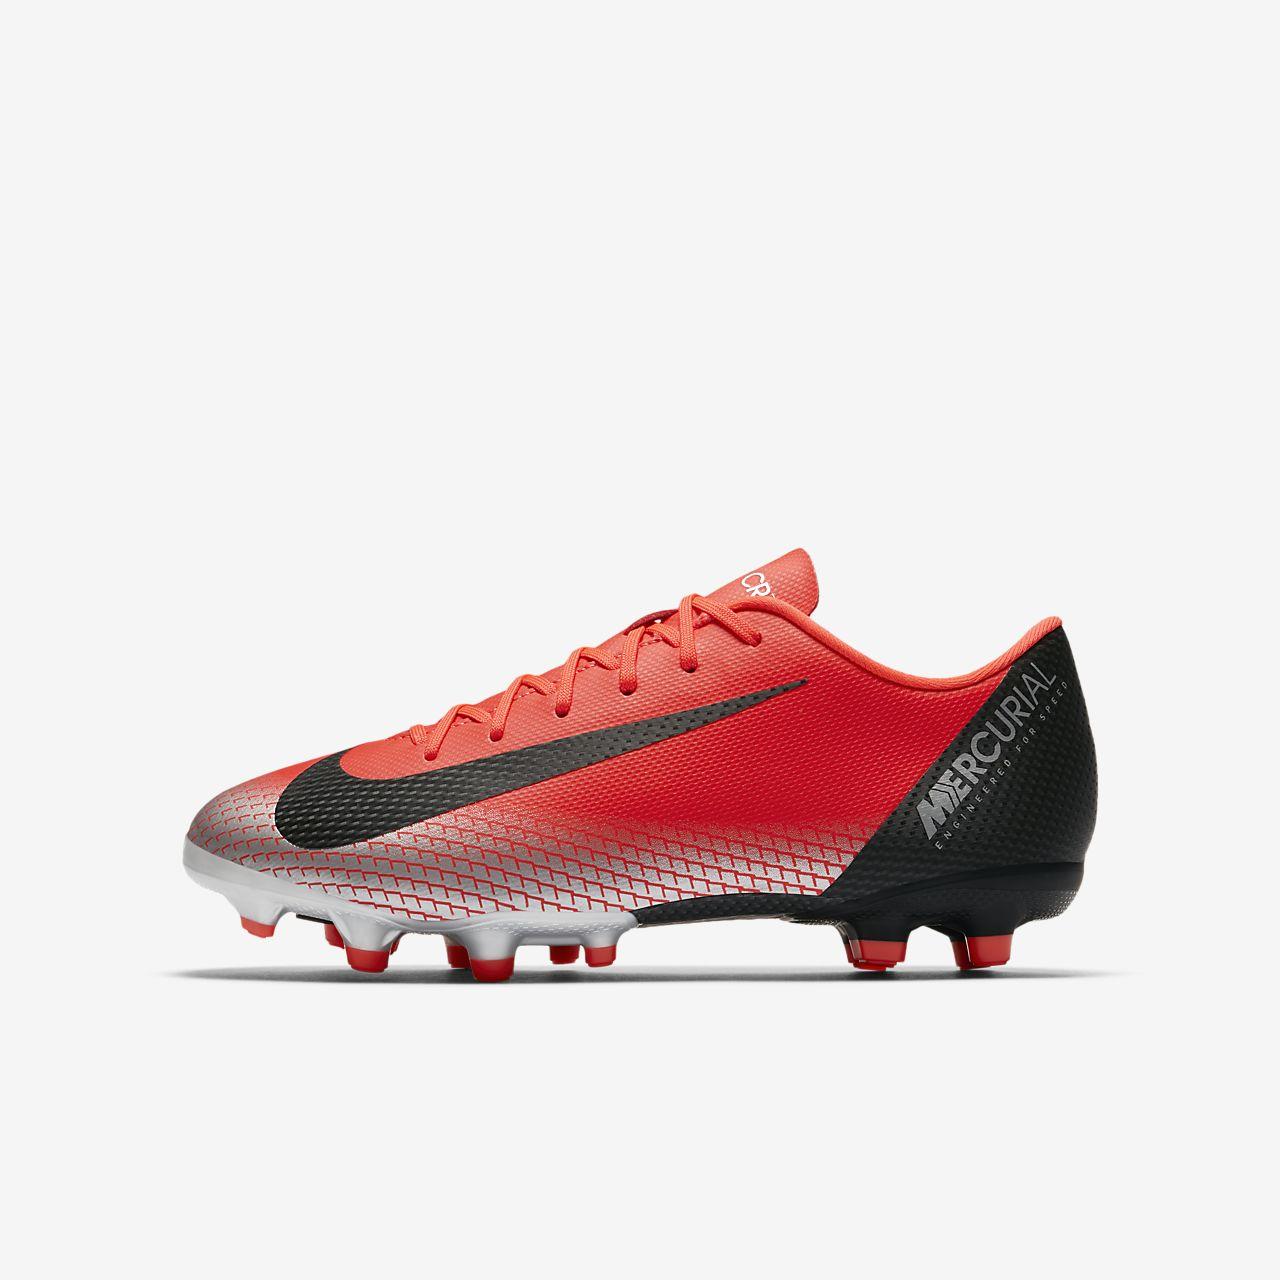 Vapor Nike Jr Multiterreno Scarpa Academy Mercurial Calcio Xii Da Yxqg16